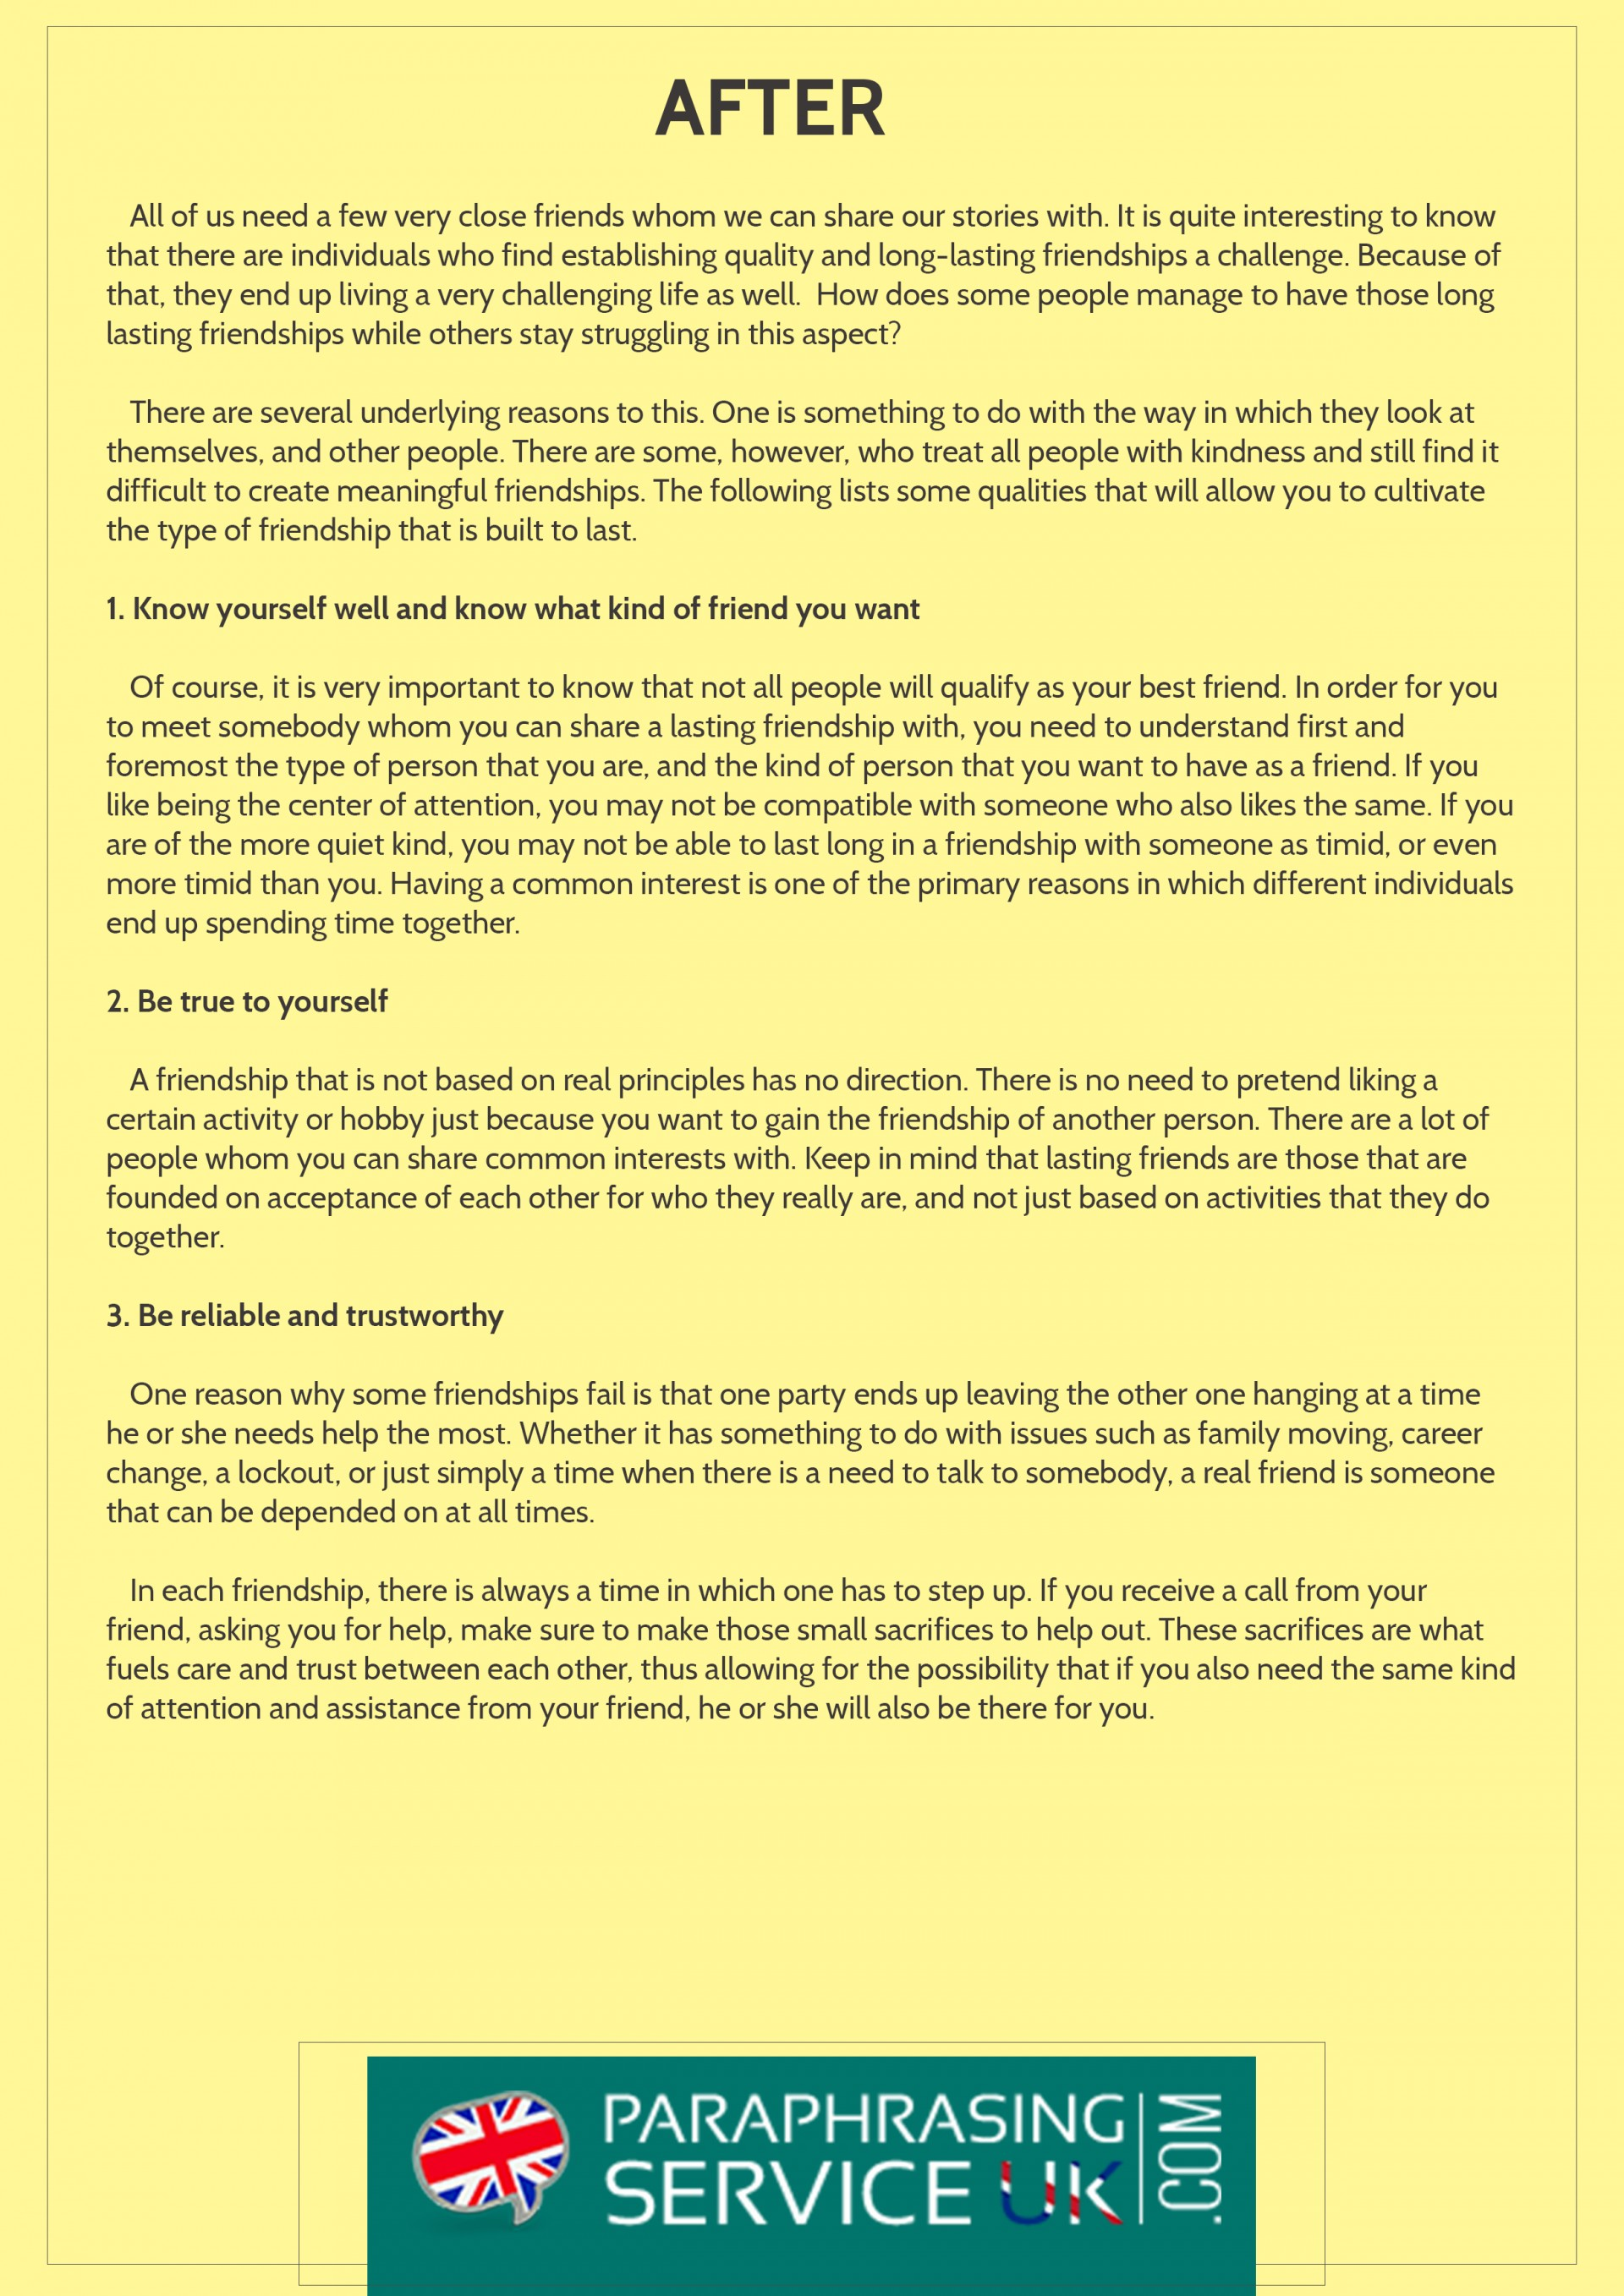 004 Paraphrased Essay Sample Example Amazing Reword Generator Free 1920